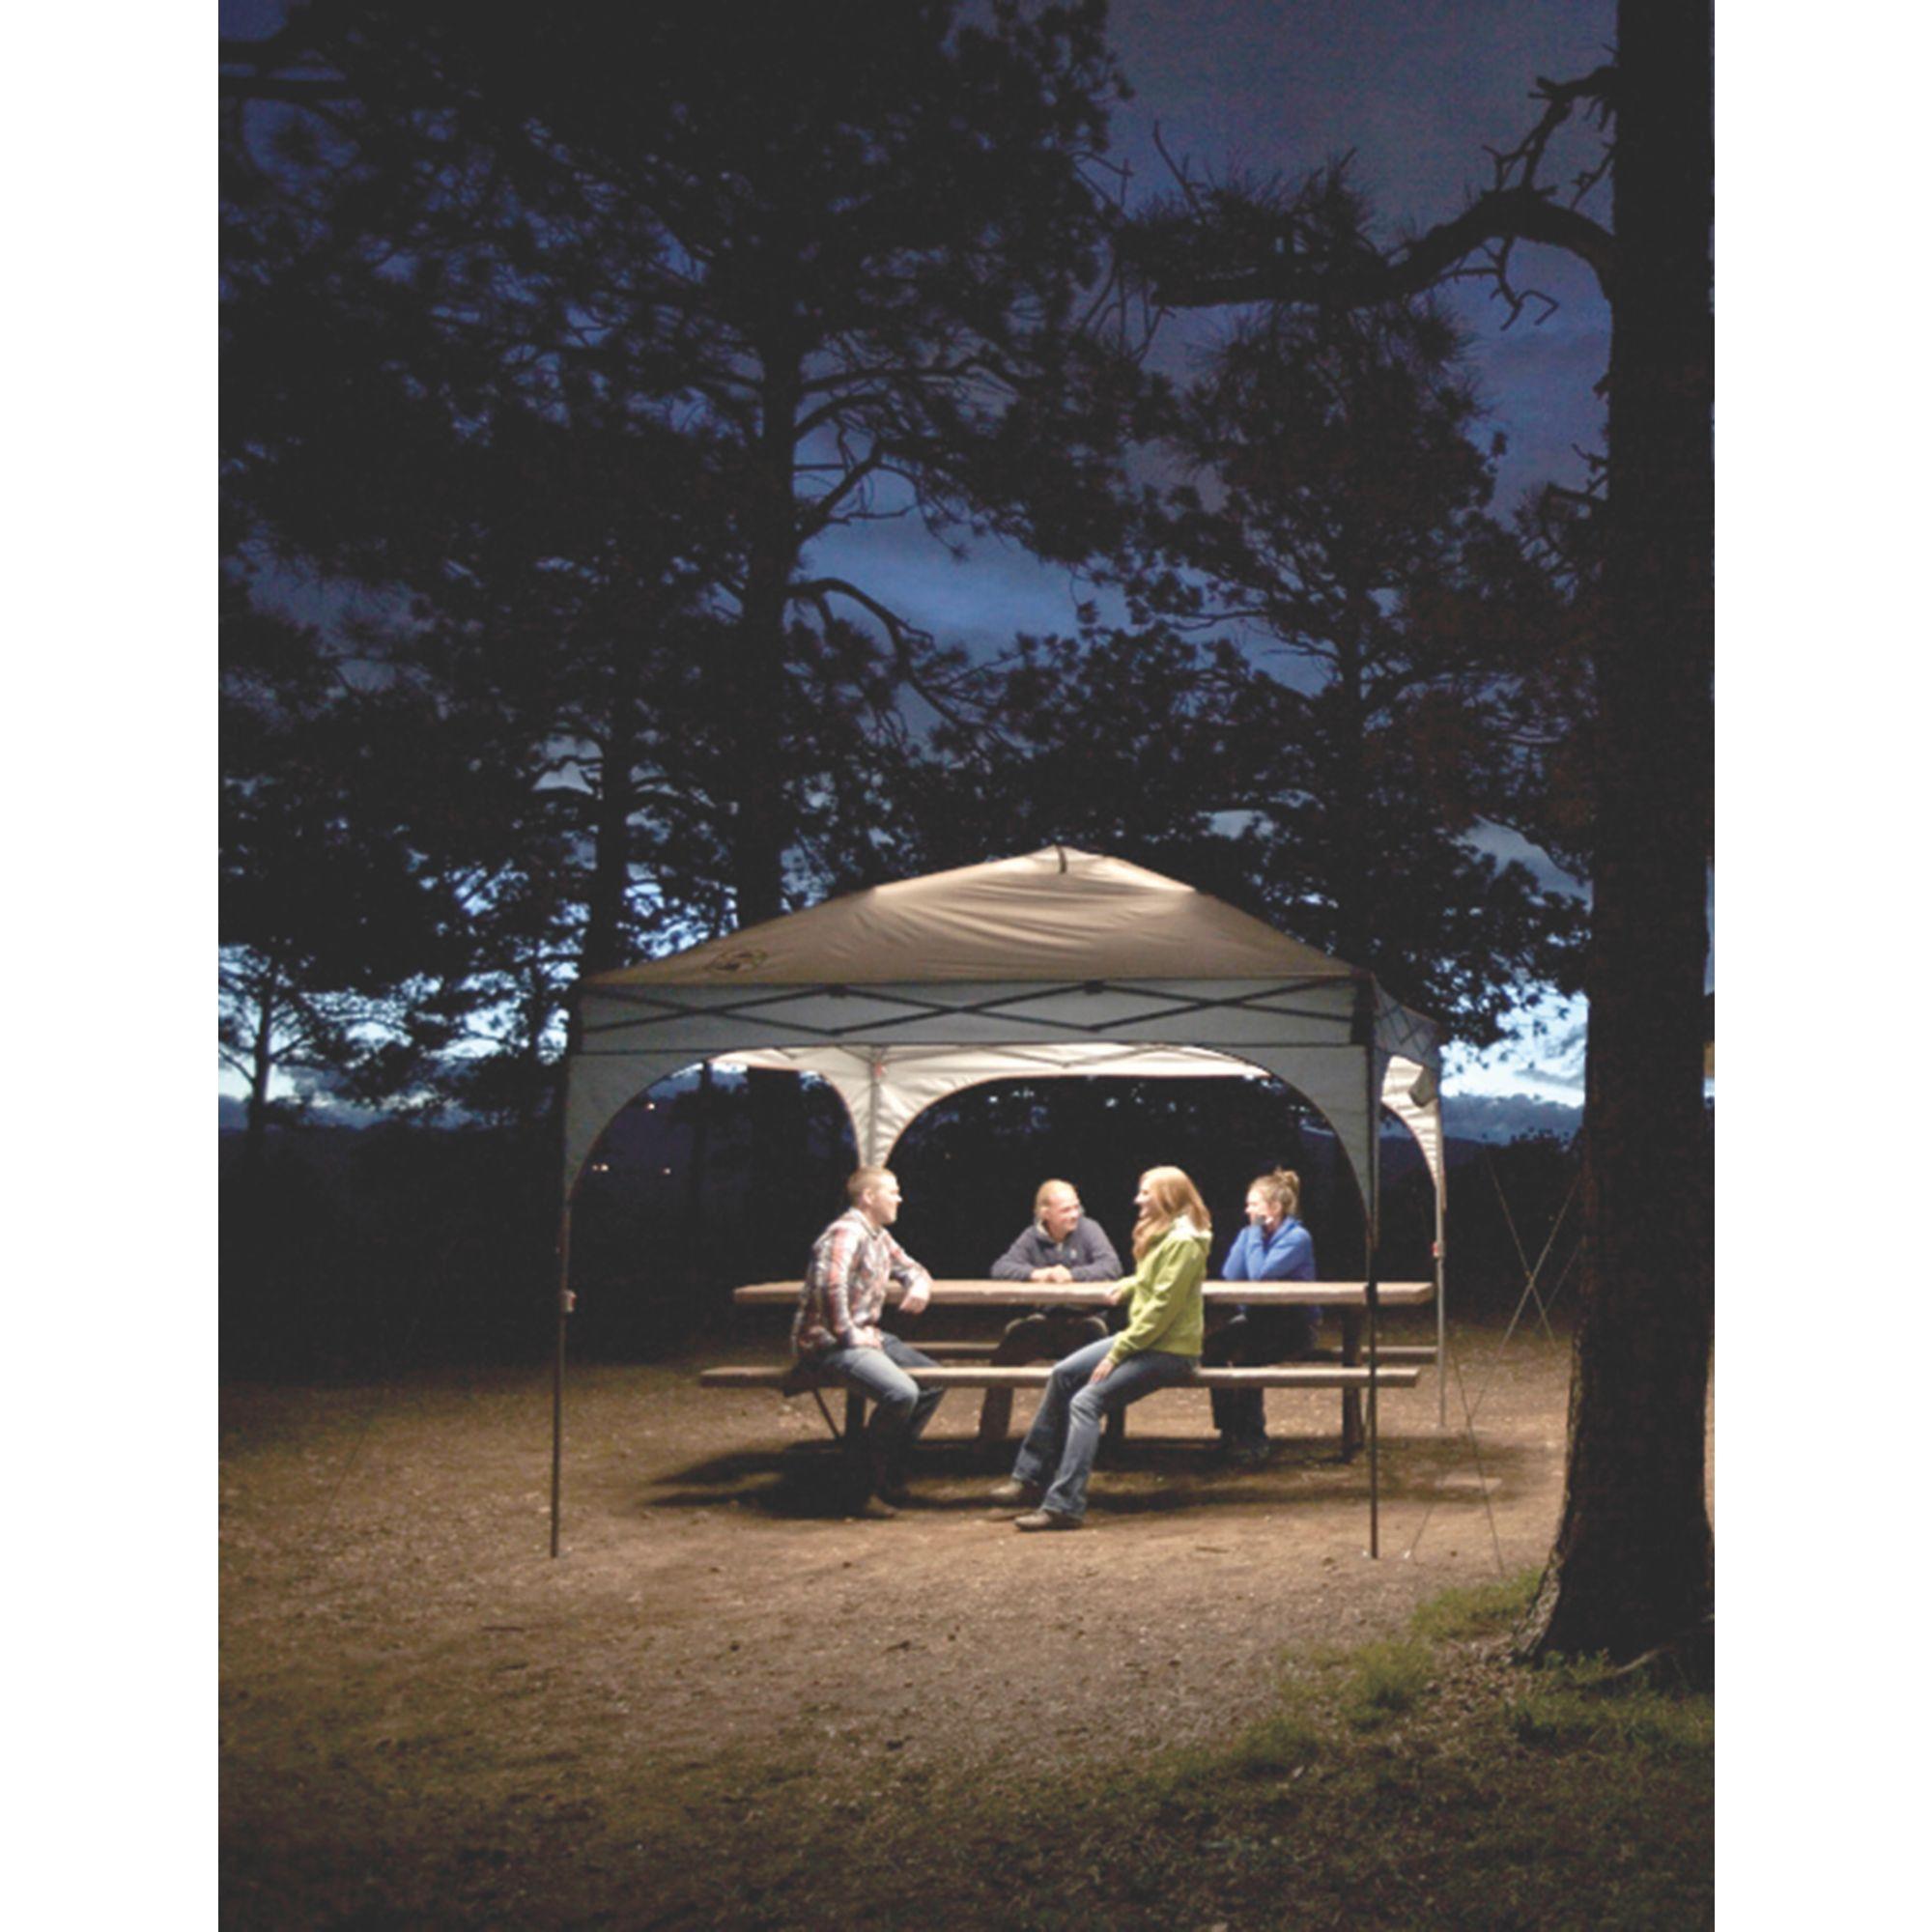 All NightTM Instant Lighted Shelter 3M X